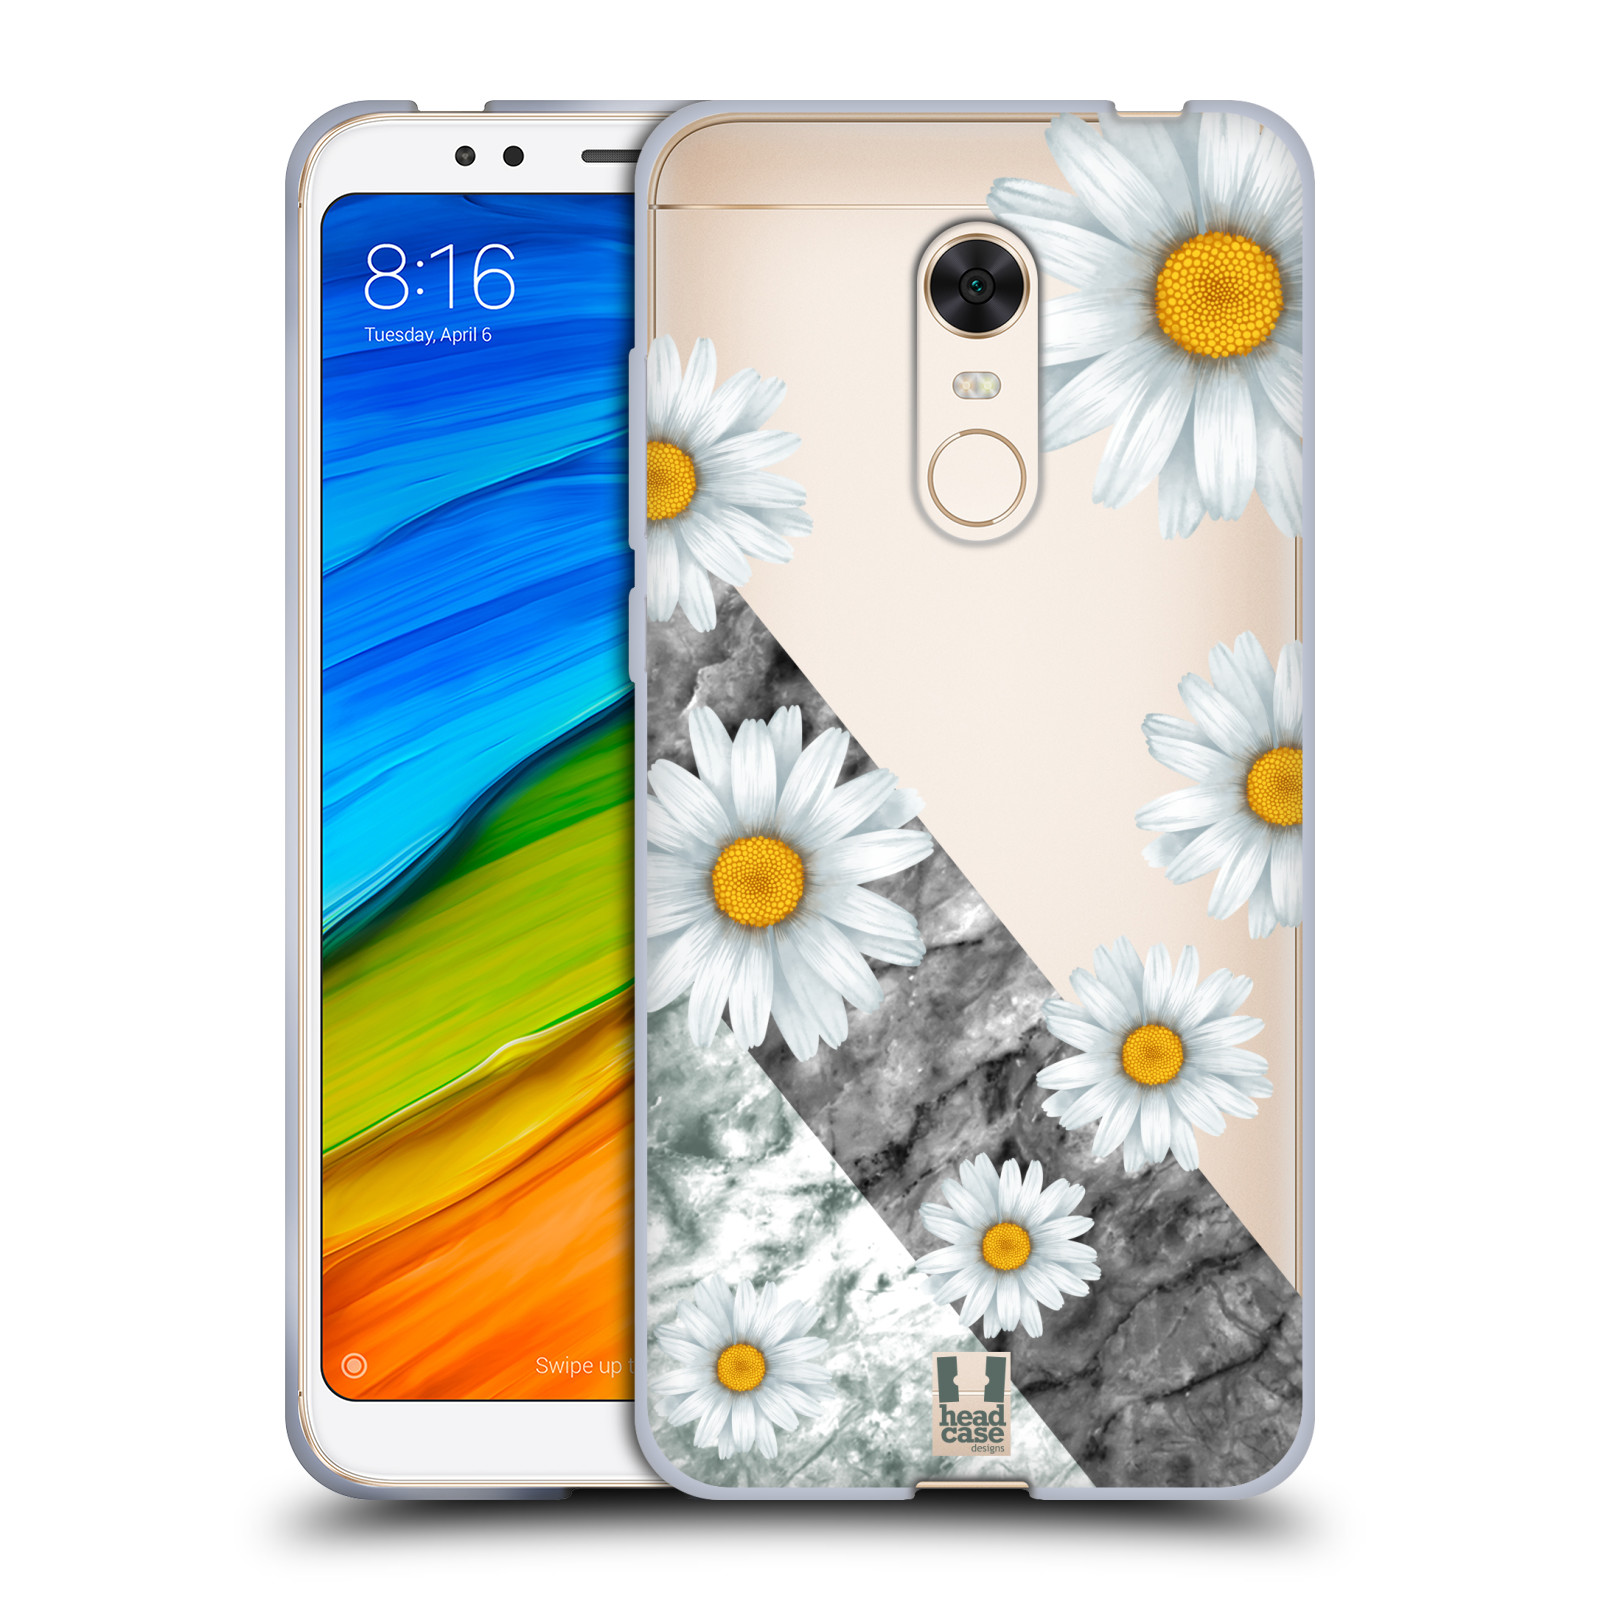 Silikonové pouzdro na mobil Xiaomi Redmi 5 Plus - Head Case - Kopretiny a mramor